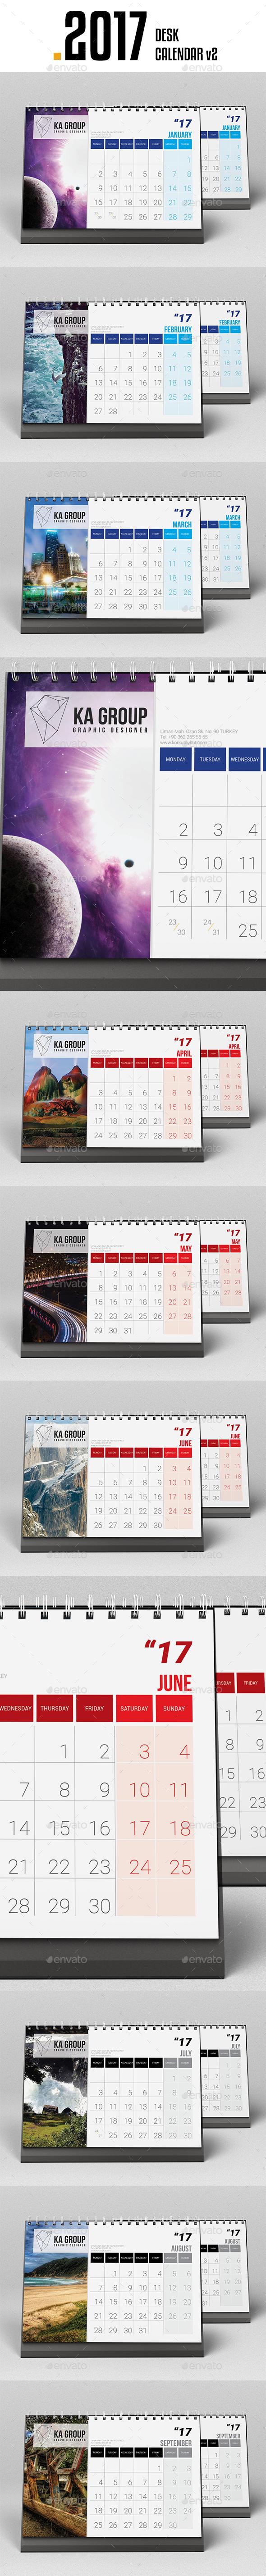 Desk Calendar 2017 v2